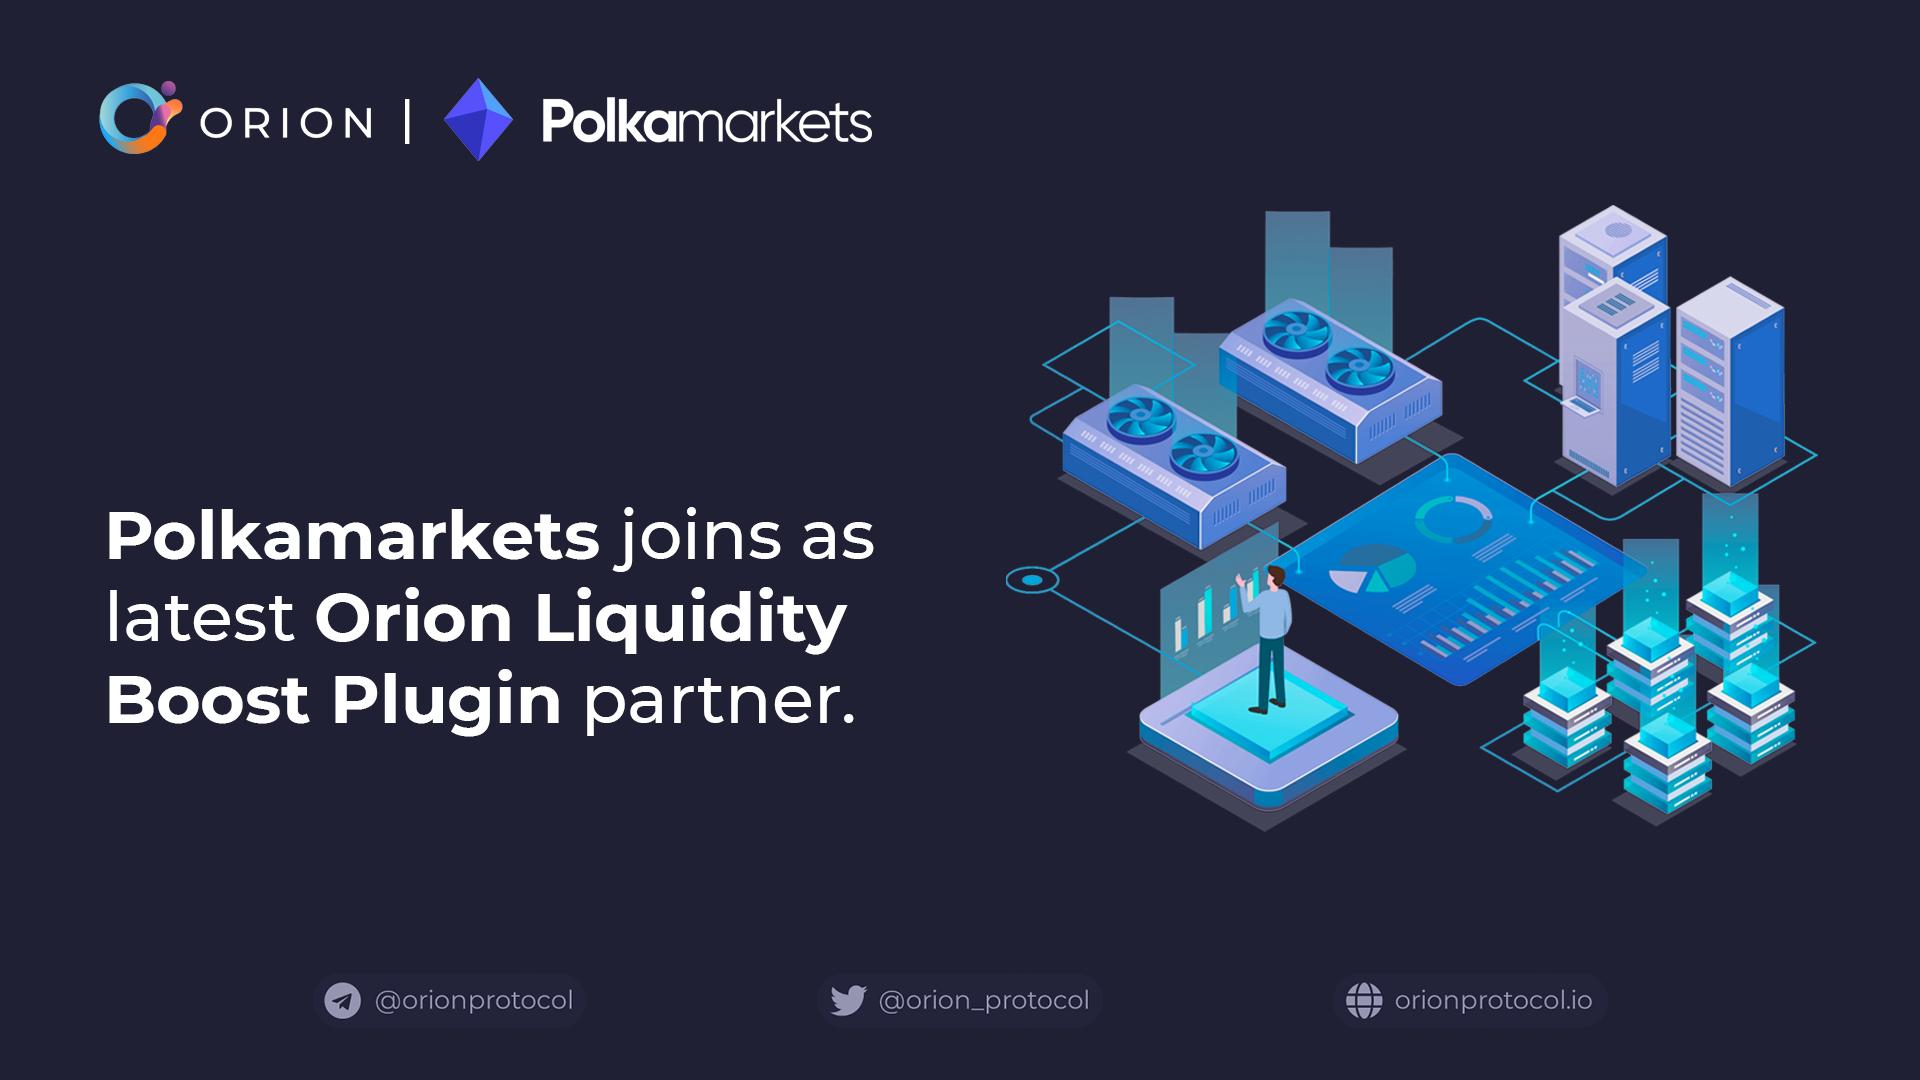 Polkamarkets joins as Liquidity Boost Plugin partner